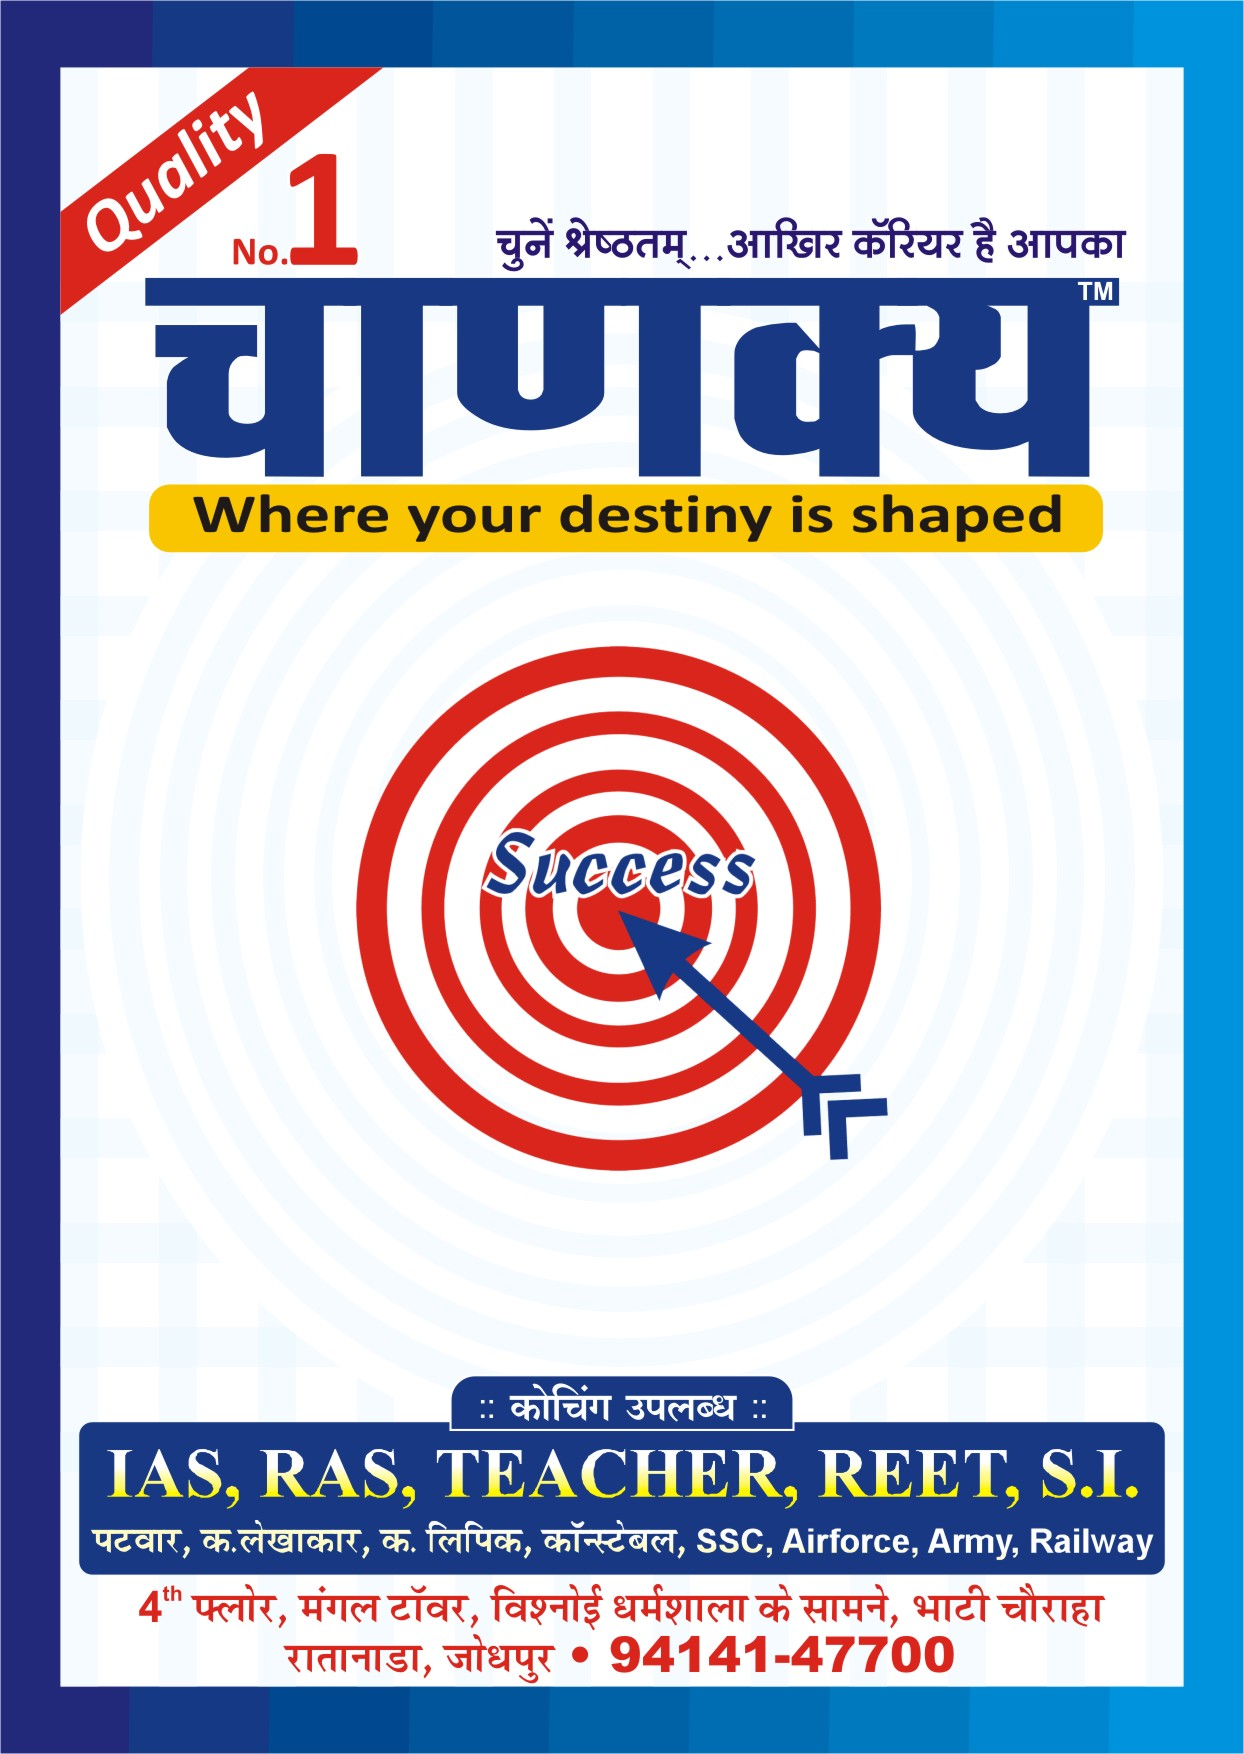 Chanakya Coaching Center